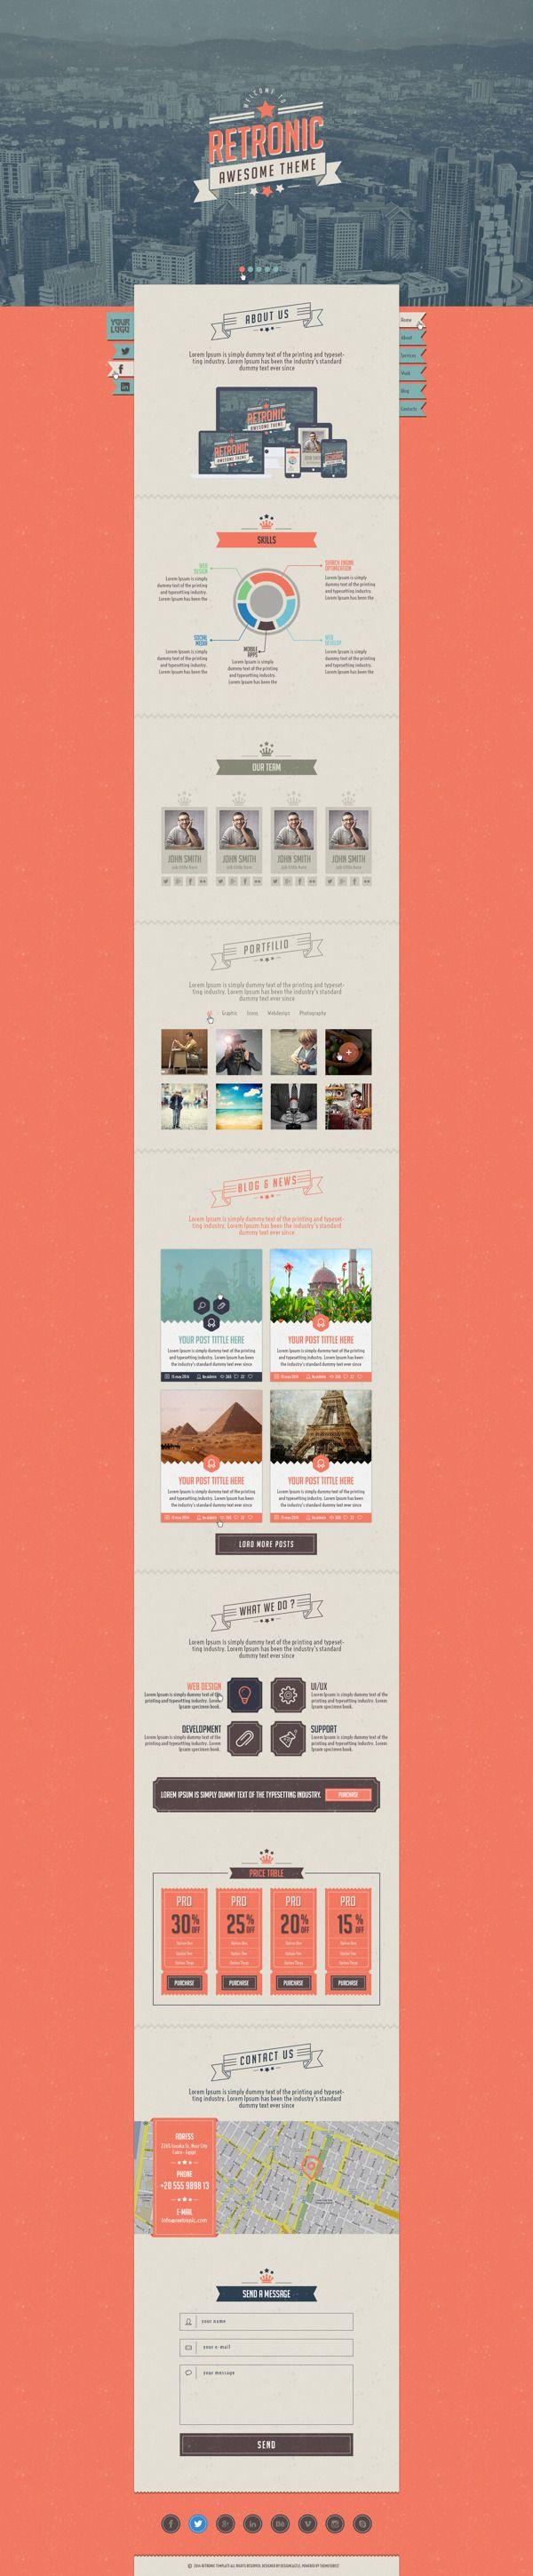 Retronic PSD Template by Abdullah Barakat, via Behance